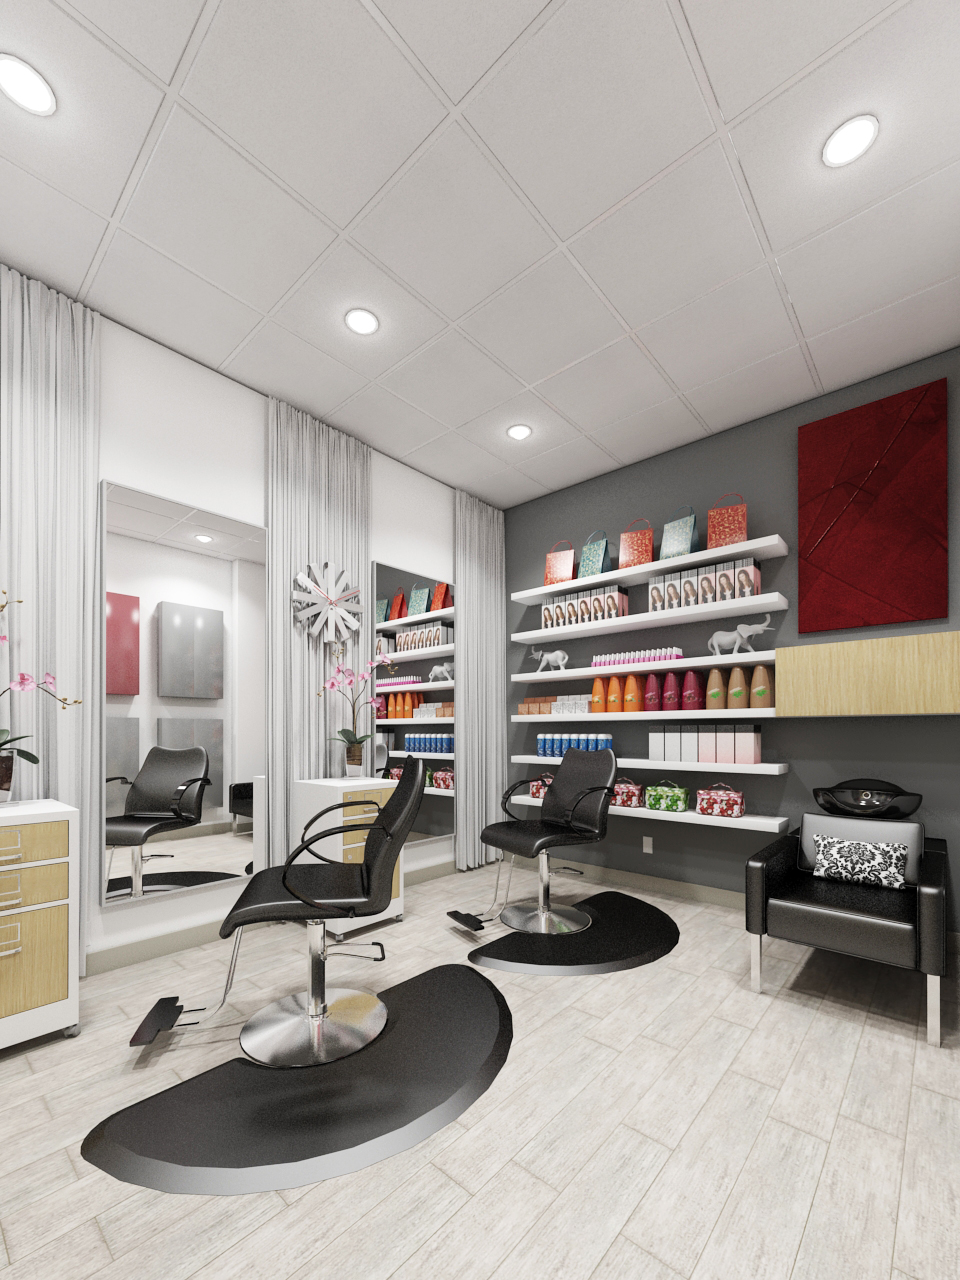 Iconic Salon